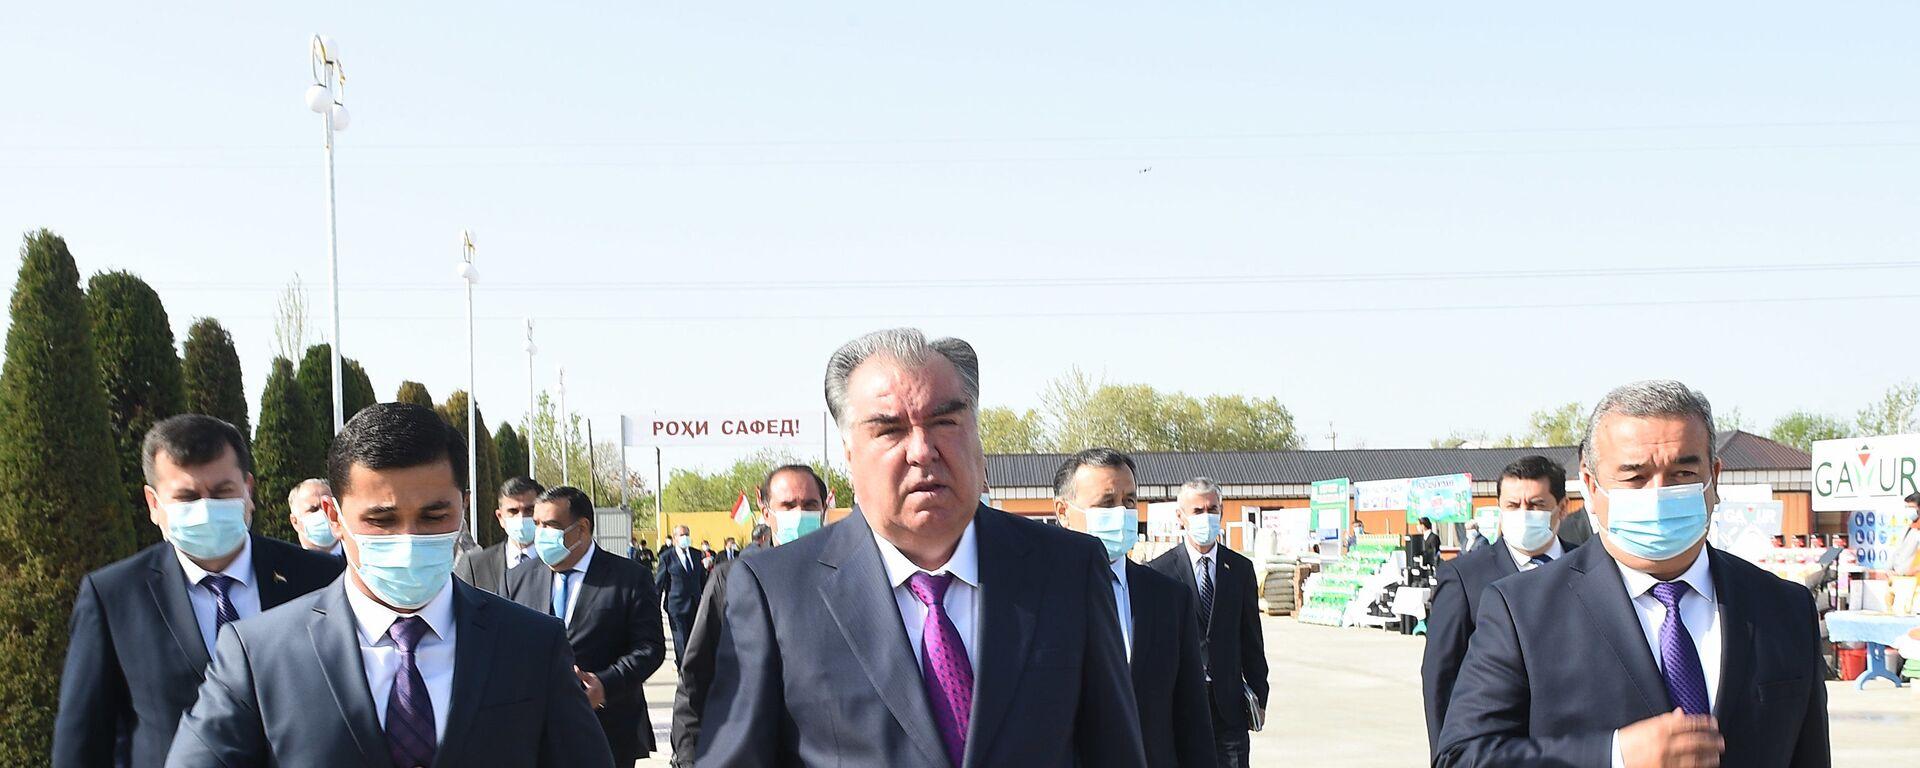 Президент Республики Таджикистан Эмомали Рахмон - Sputnik Таджикистан, 1920, 25.03.2021